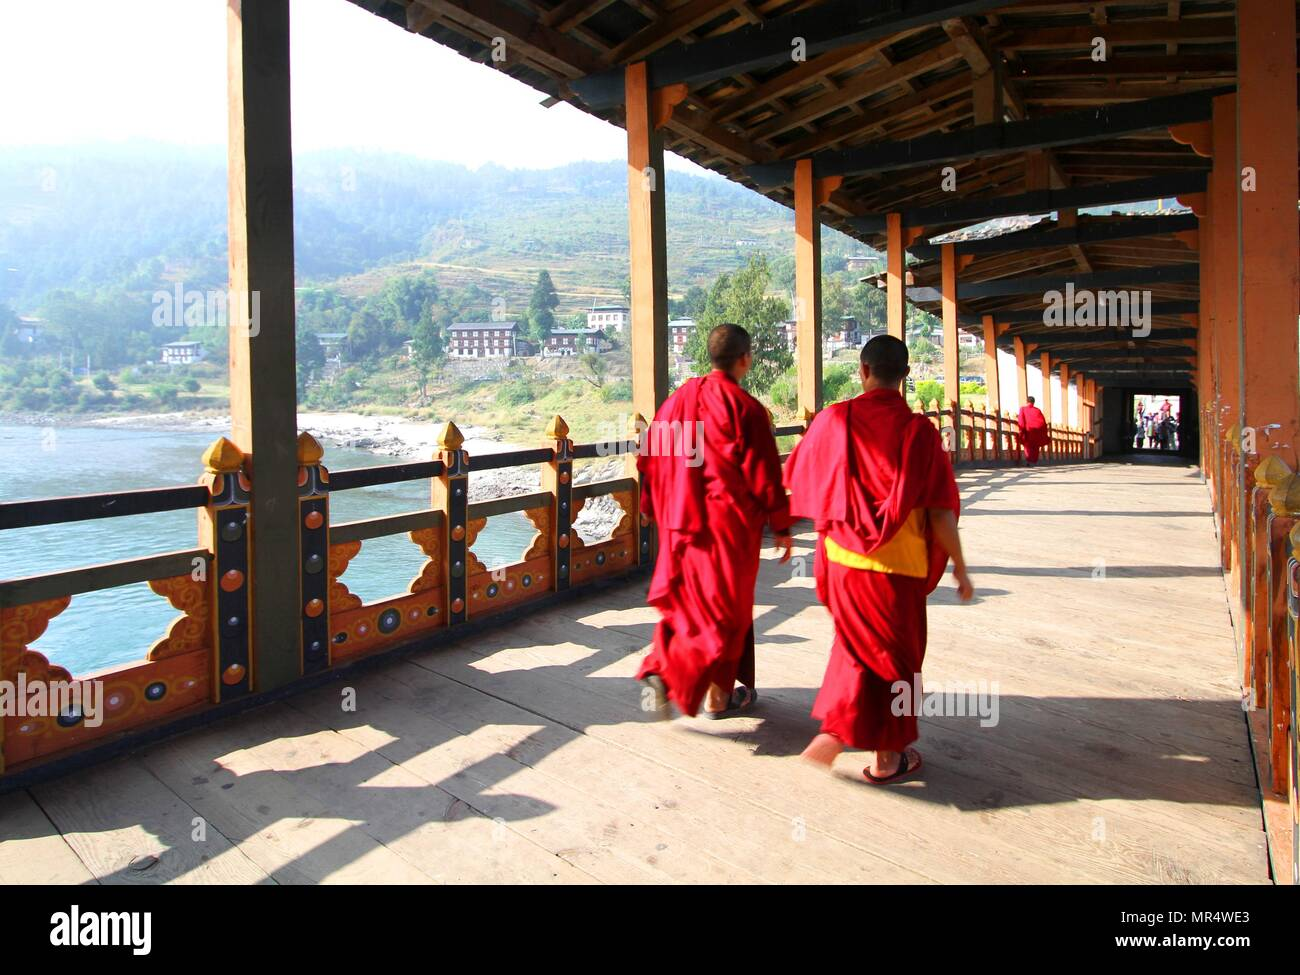 Two young monks walking on  PUNA MOCCHU BAZAM : Antique  wooden bridge at Punakha Dzong Monastery or Pungthang Dewachen Phodrang  Bhutan - Stock Image